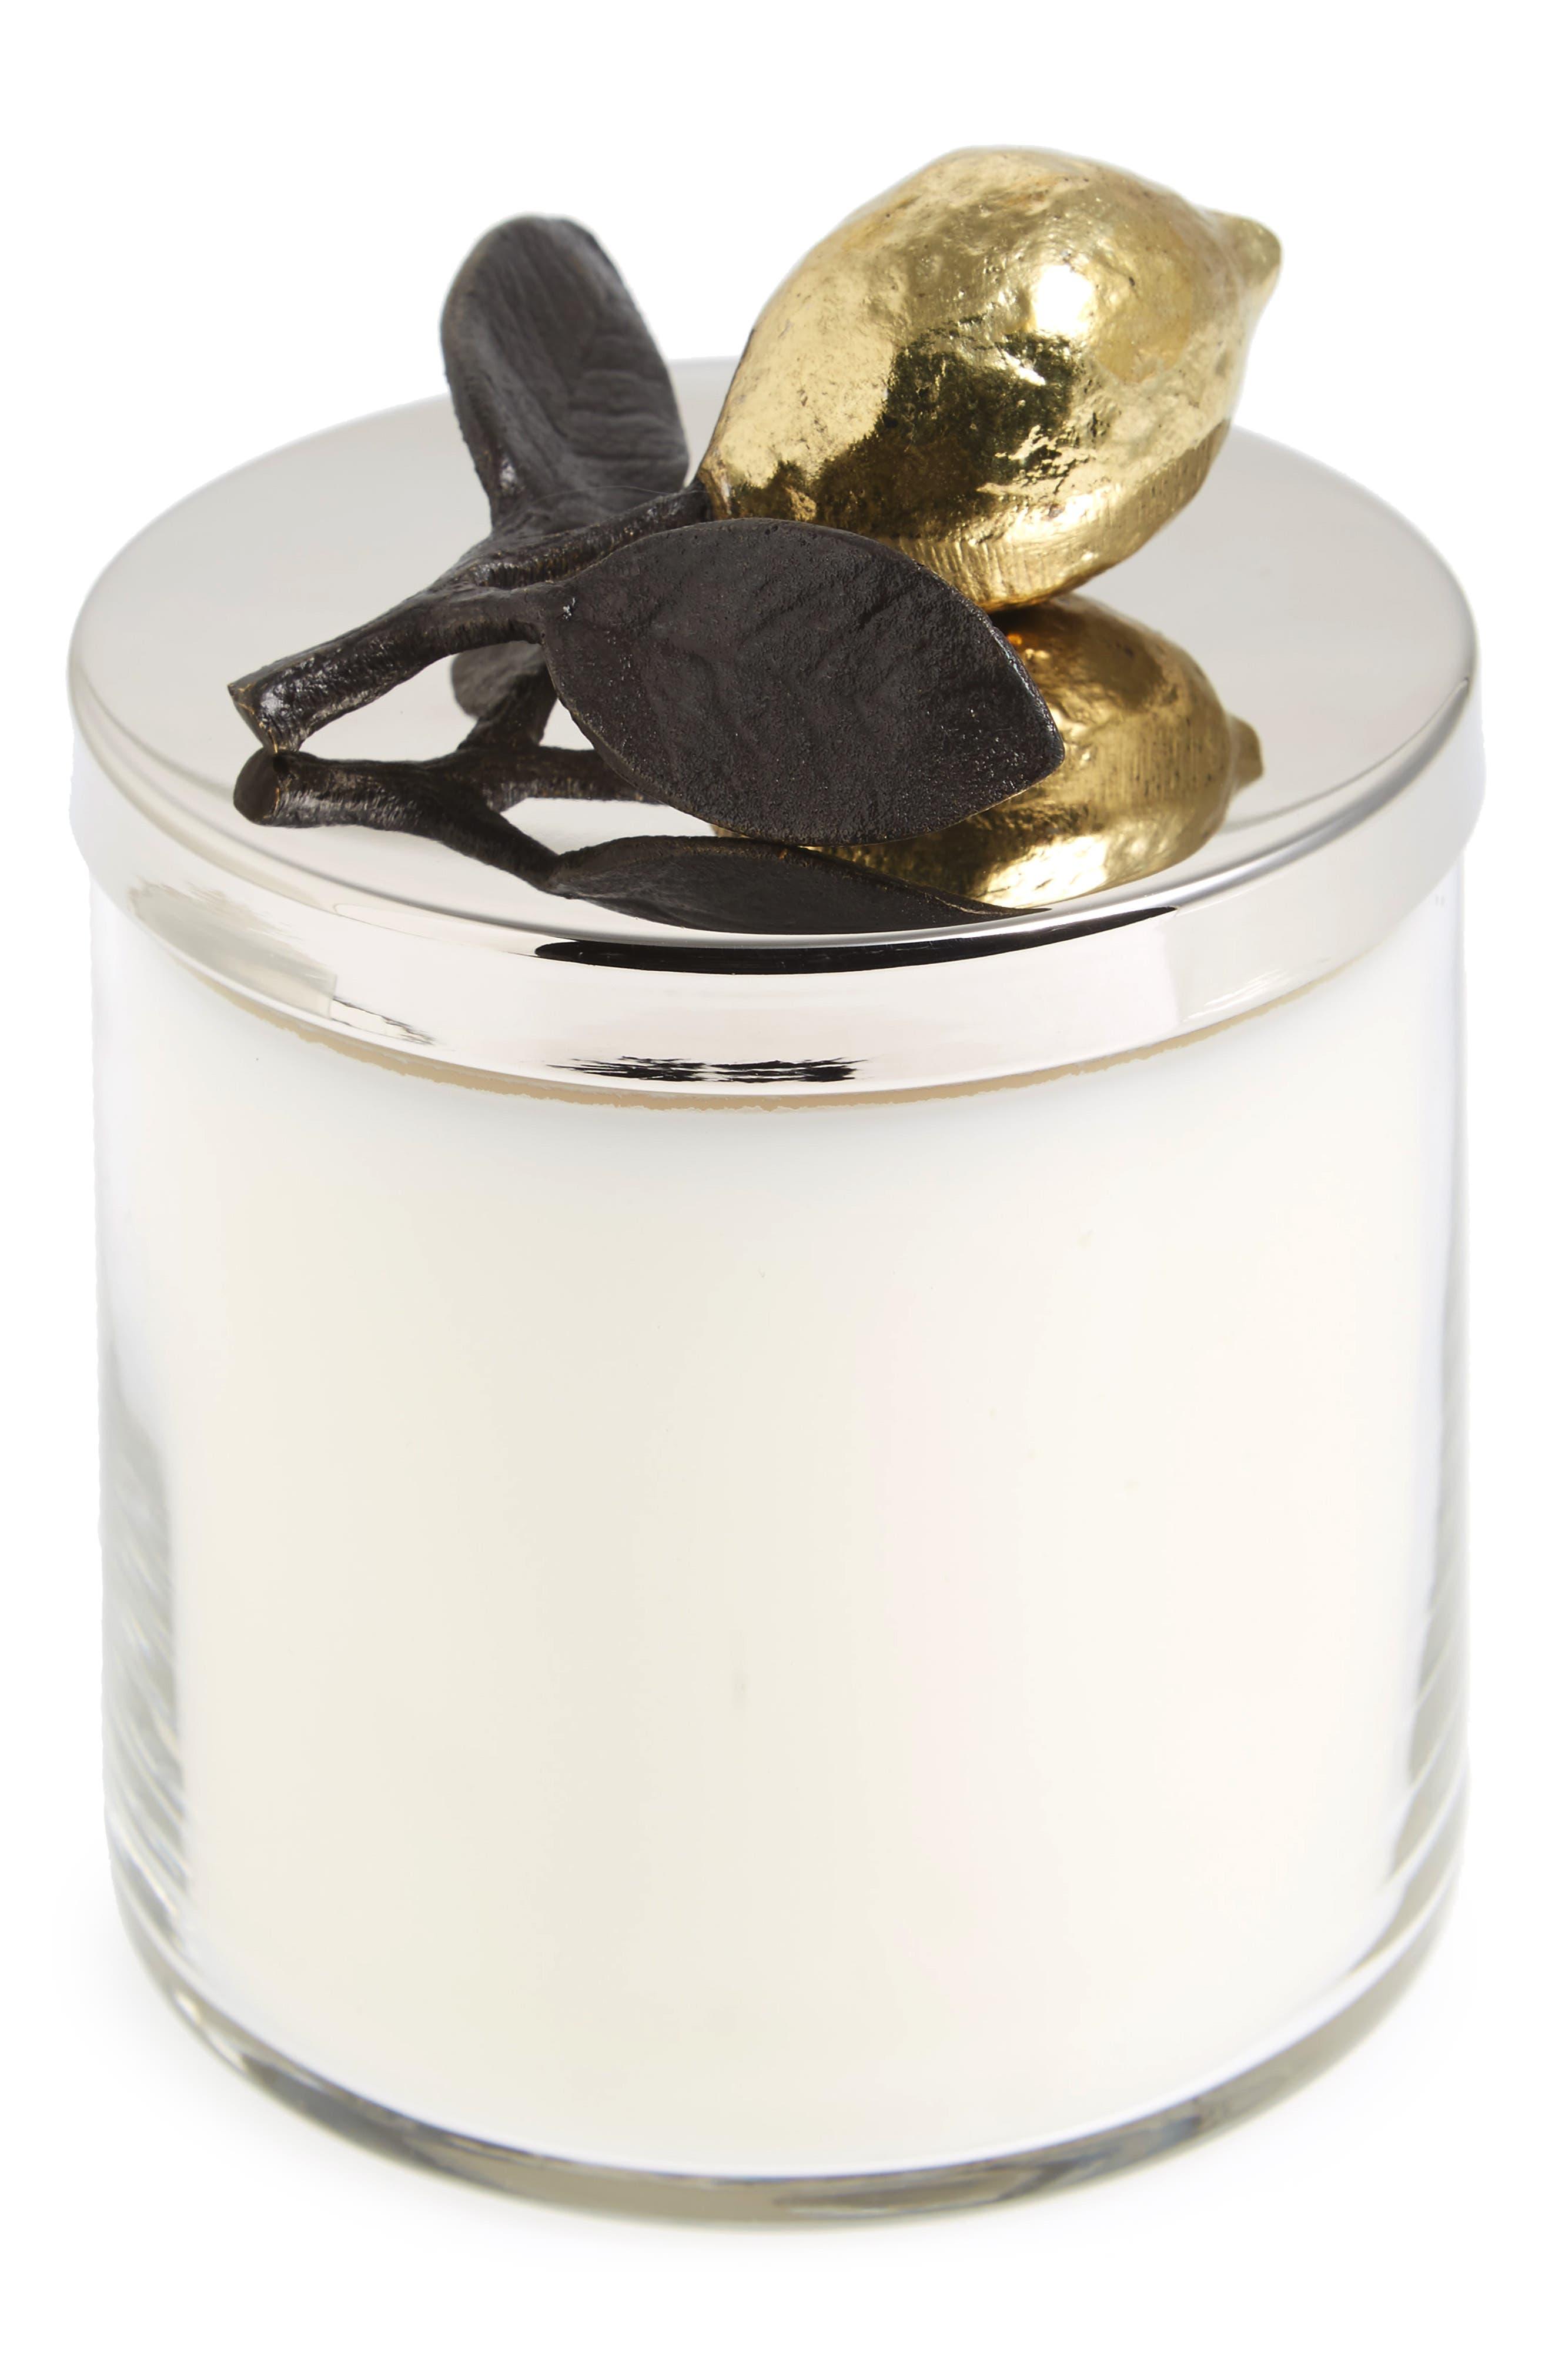 Alternate Image 1 Selected - Michael Aram 'Lemonwood' Soy Wax Candle